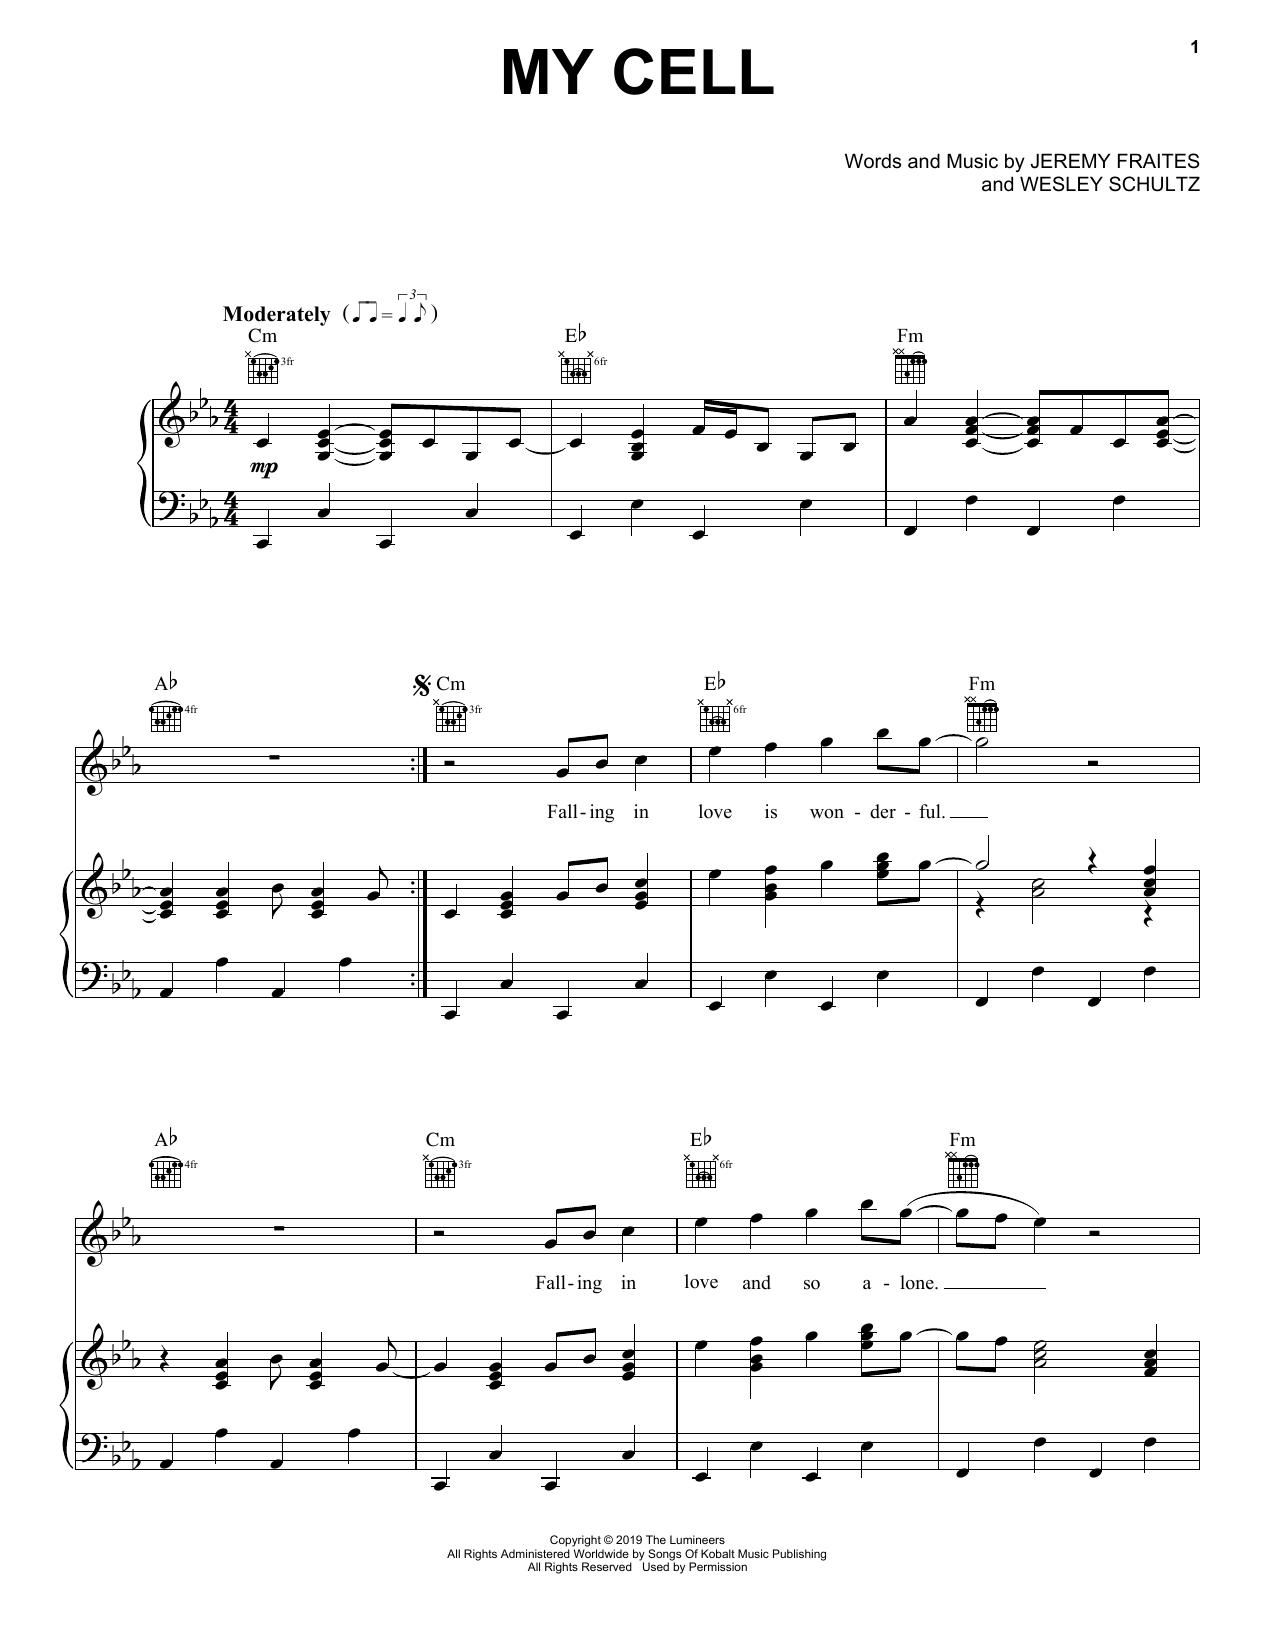 The Lumineers My Cell 432708 Sheet music, Pop sheet